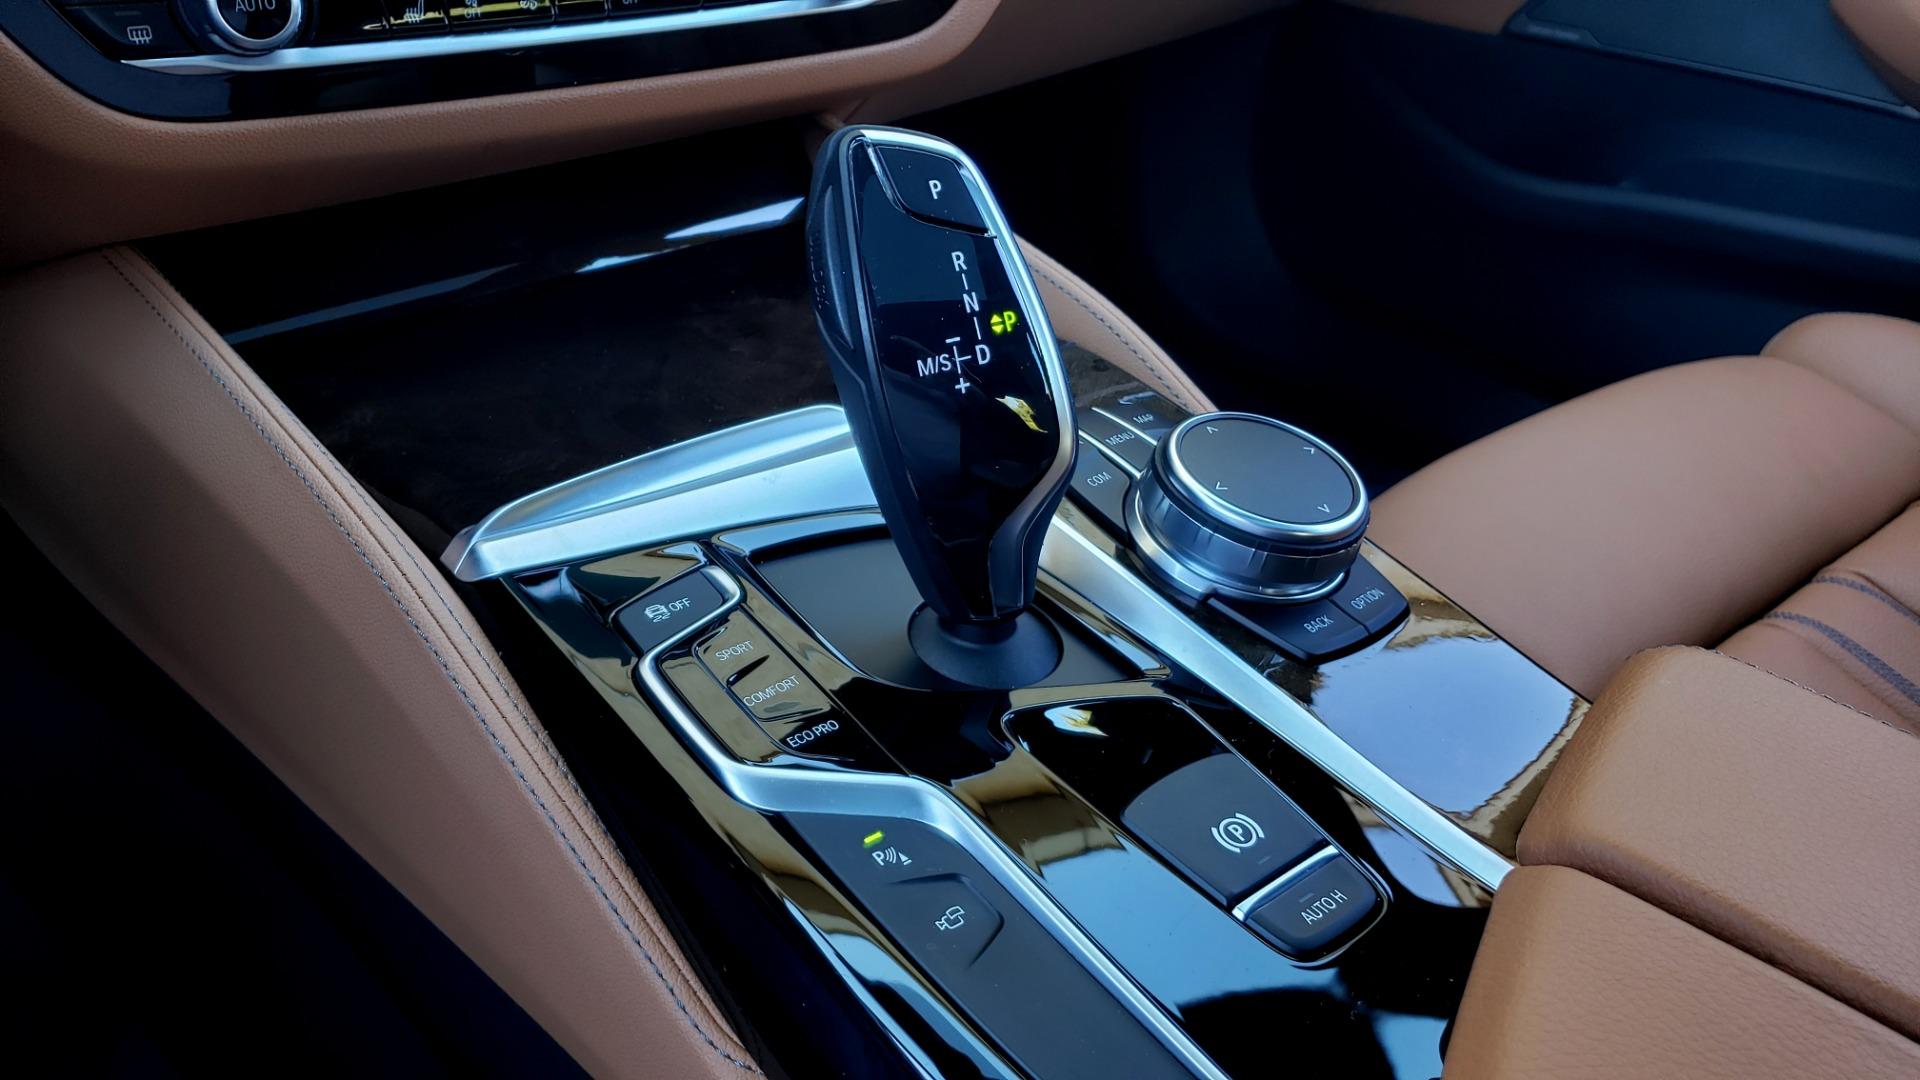 Used 2018 BMW 5 SERIES 540I M-SPORT / DRVR ASST / EXEC PKG / NAV / SUNROOF / HUD / REARVIEW for sale Sold at Formula Imports in Charlotte NC 28227 51